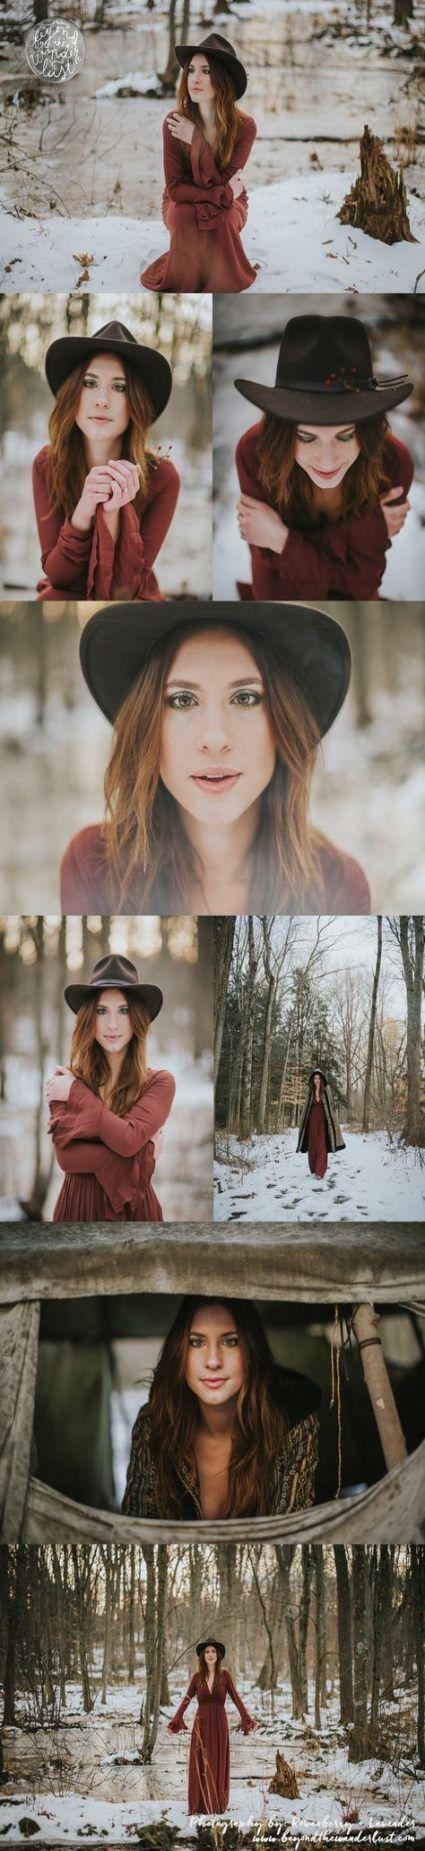 #photography #winter #ideas #women #style56+ Ideas Photography Women Winter Styl…